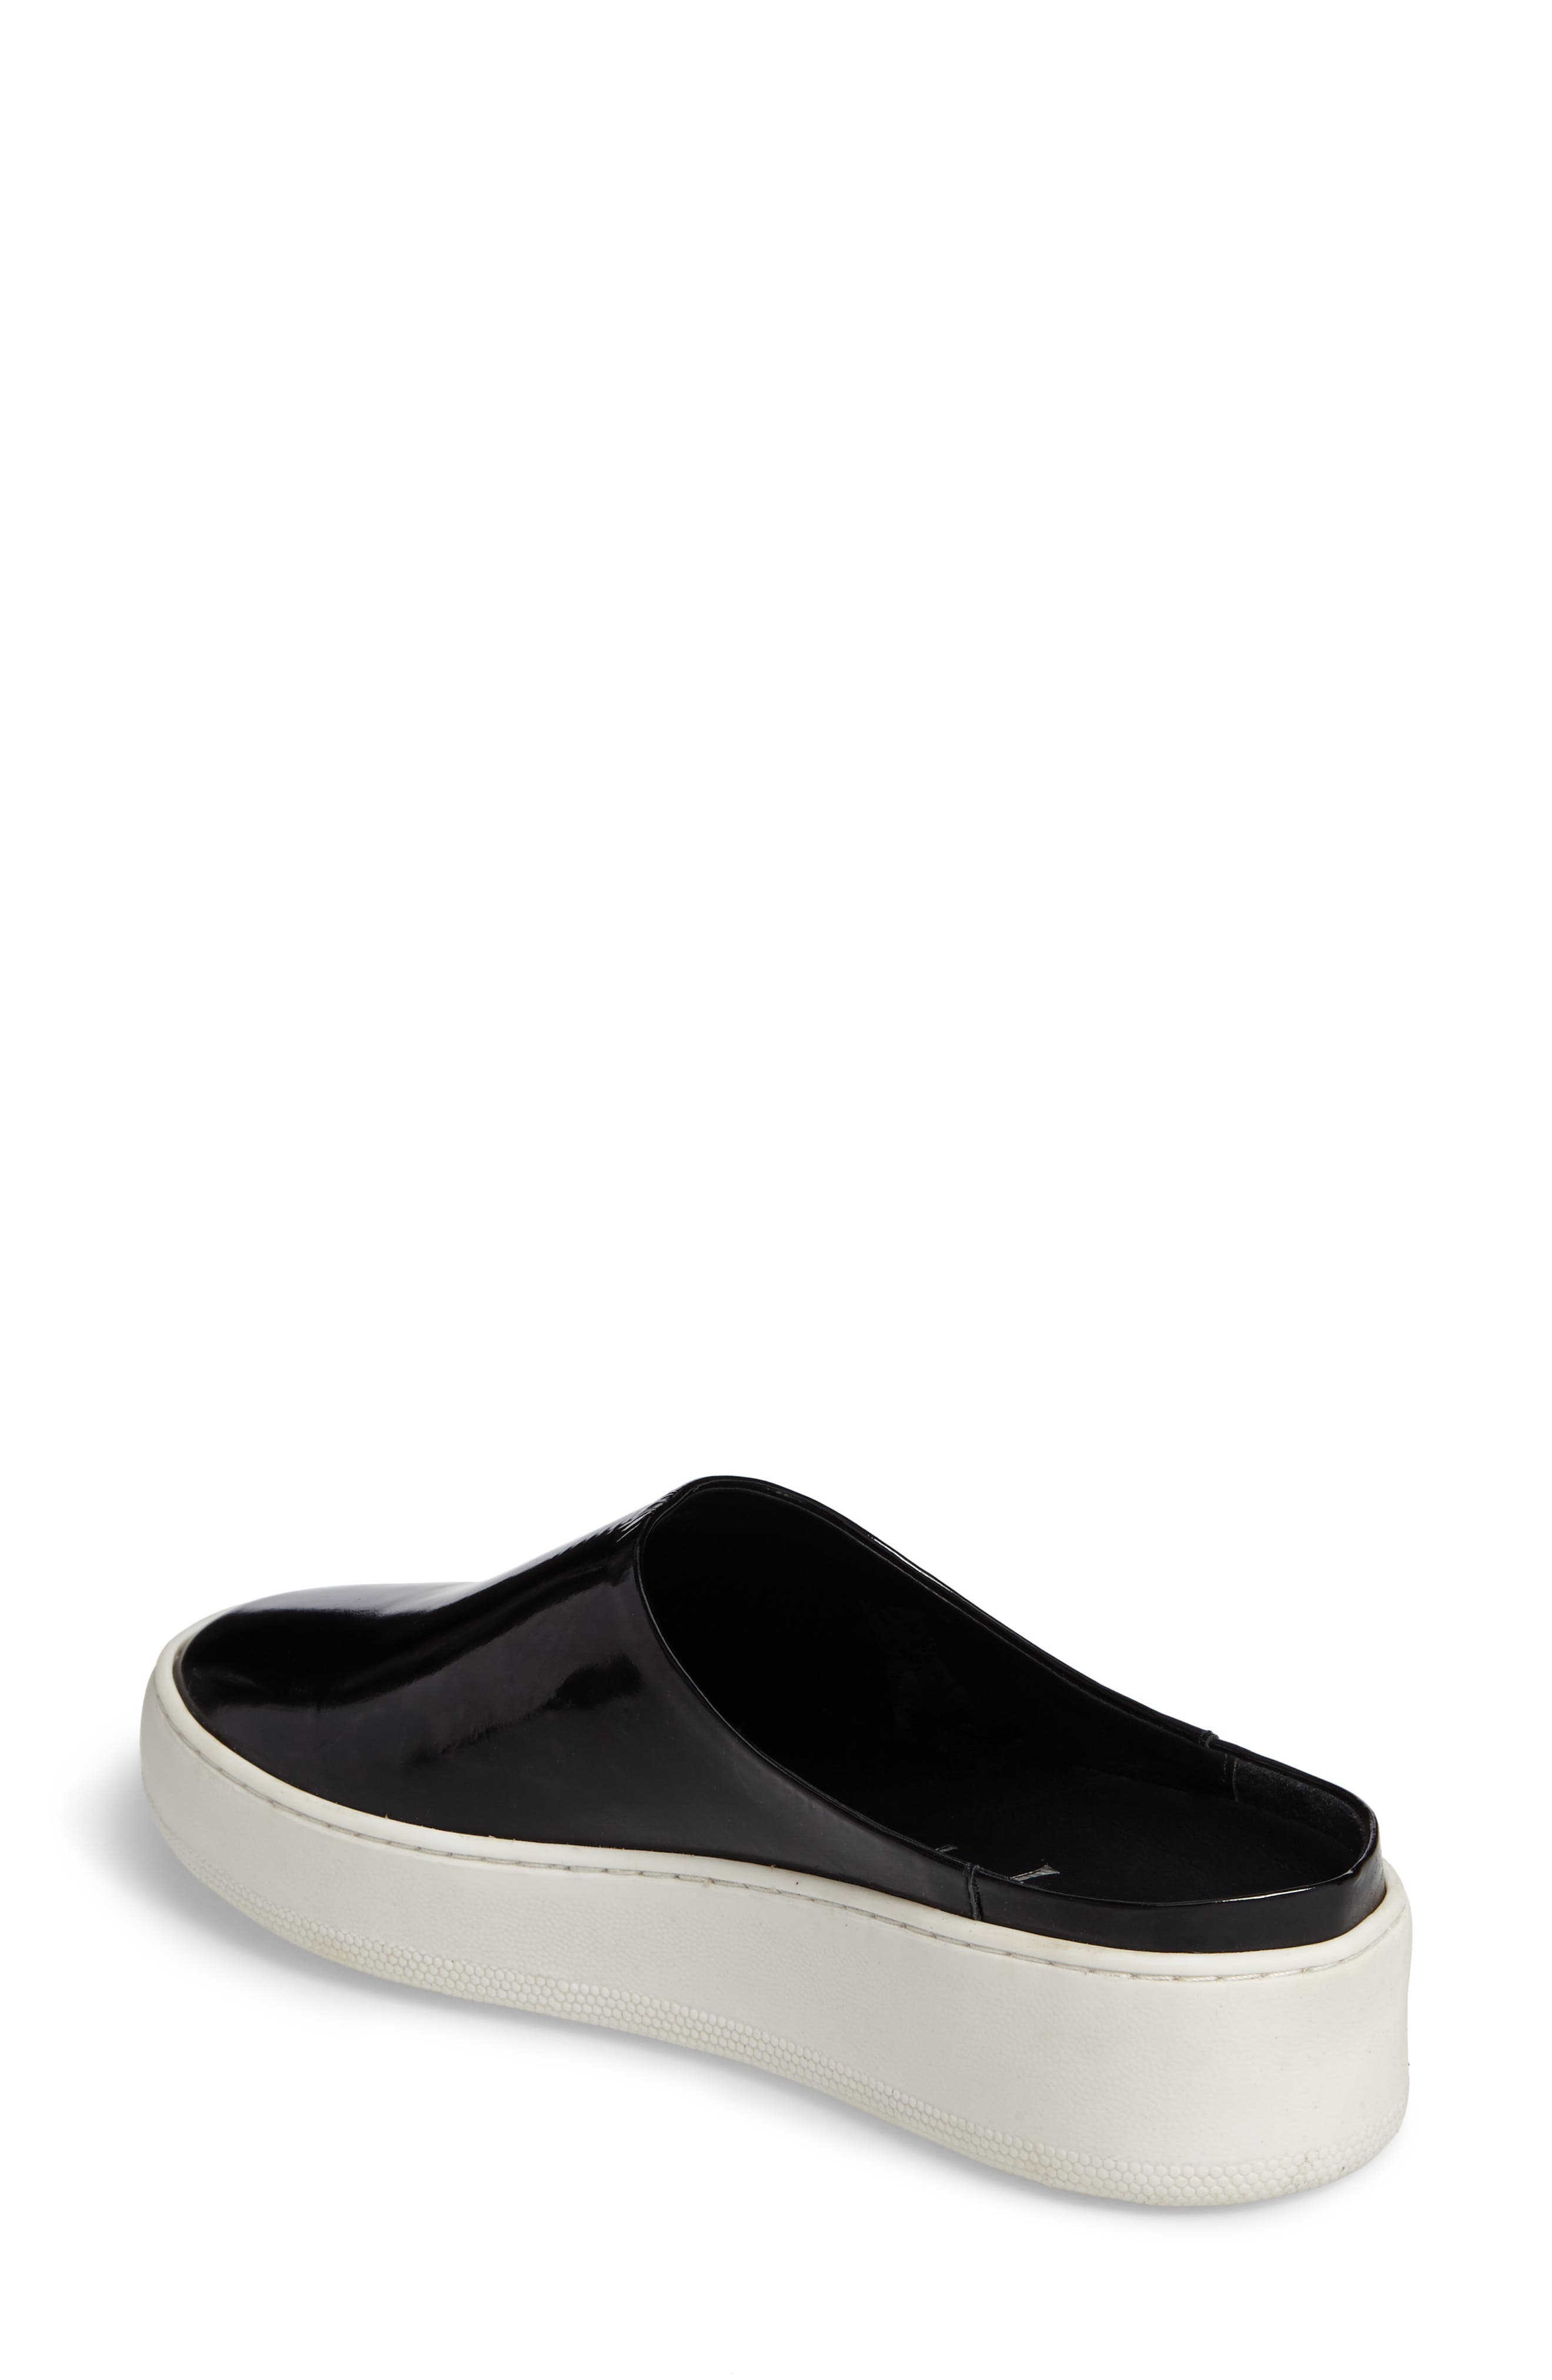 Alternate Image 2  - Free People Wynwood Slip-On Sneaker (Women)